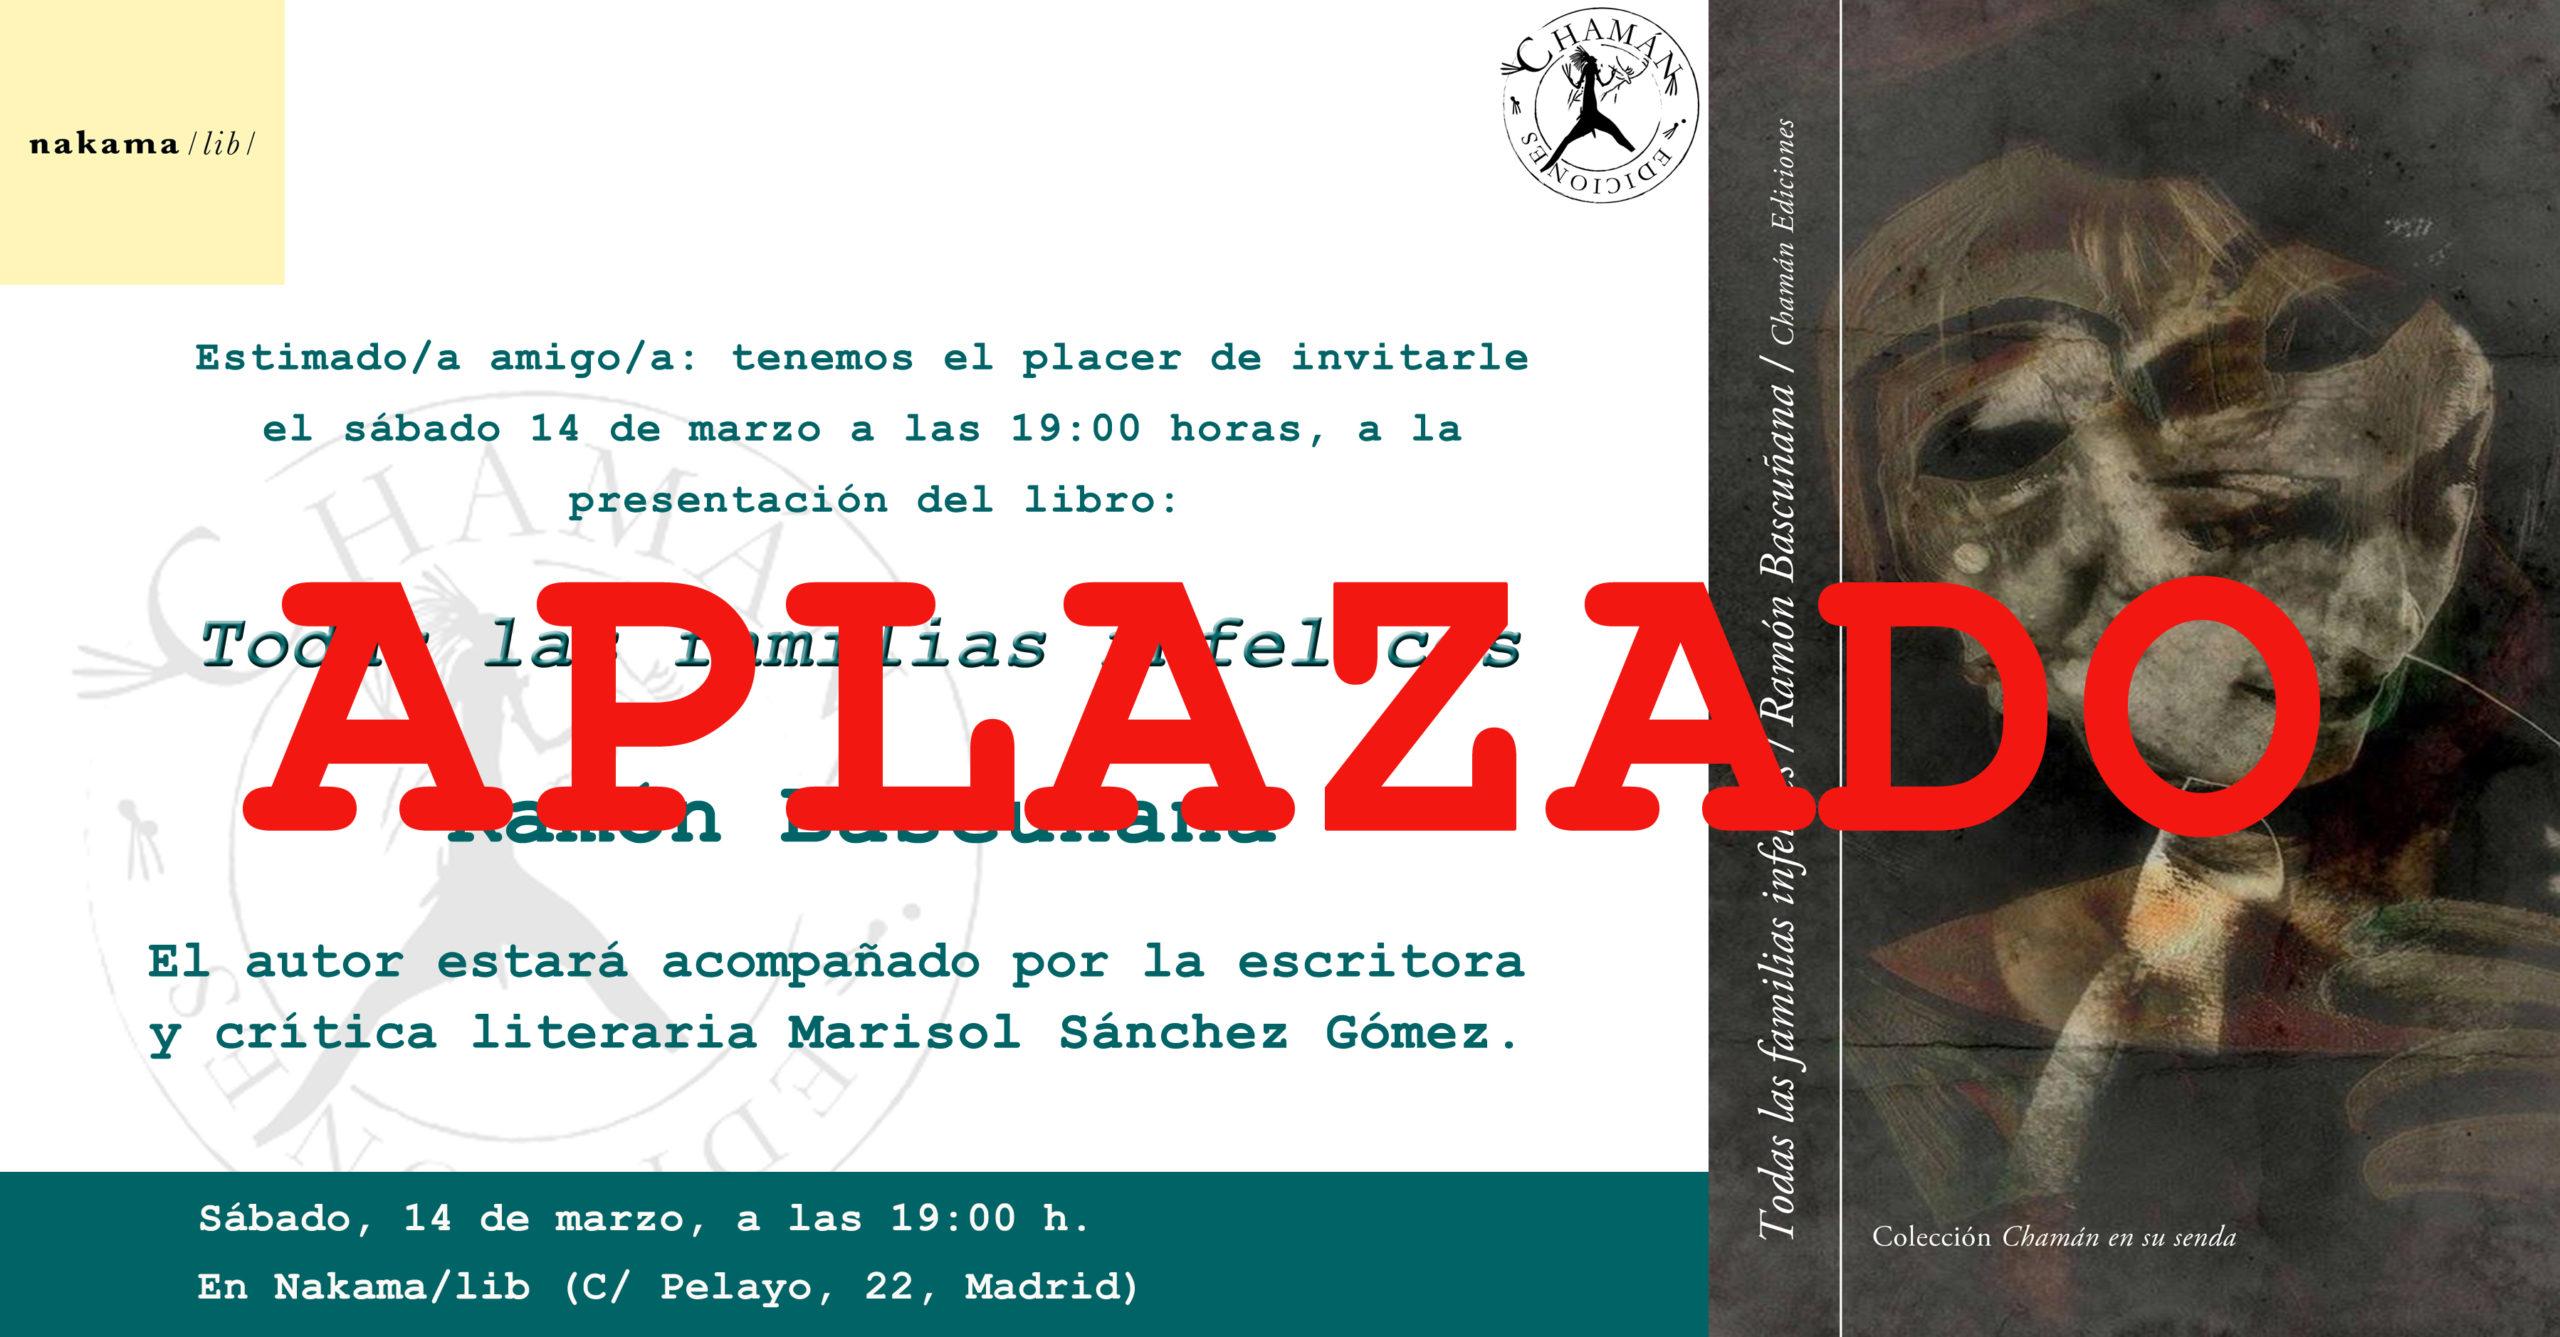 InvitacionTodaslasfamilias_Madrid_Nakama